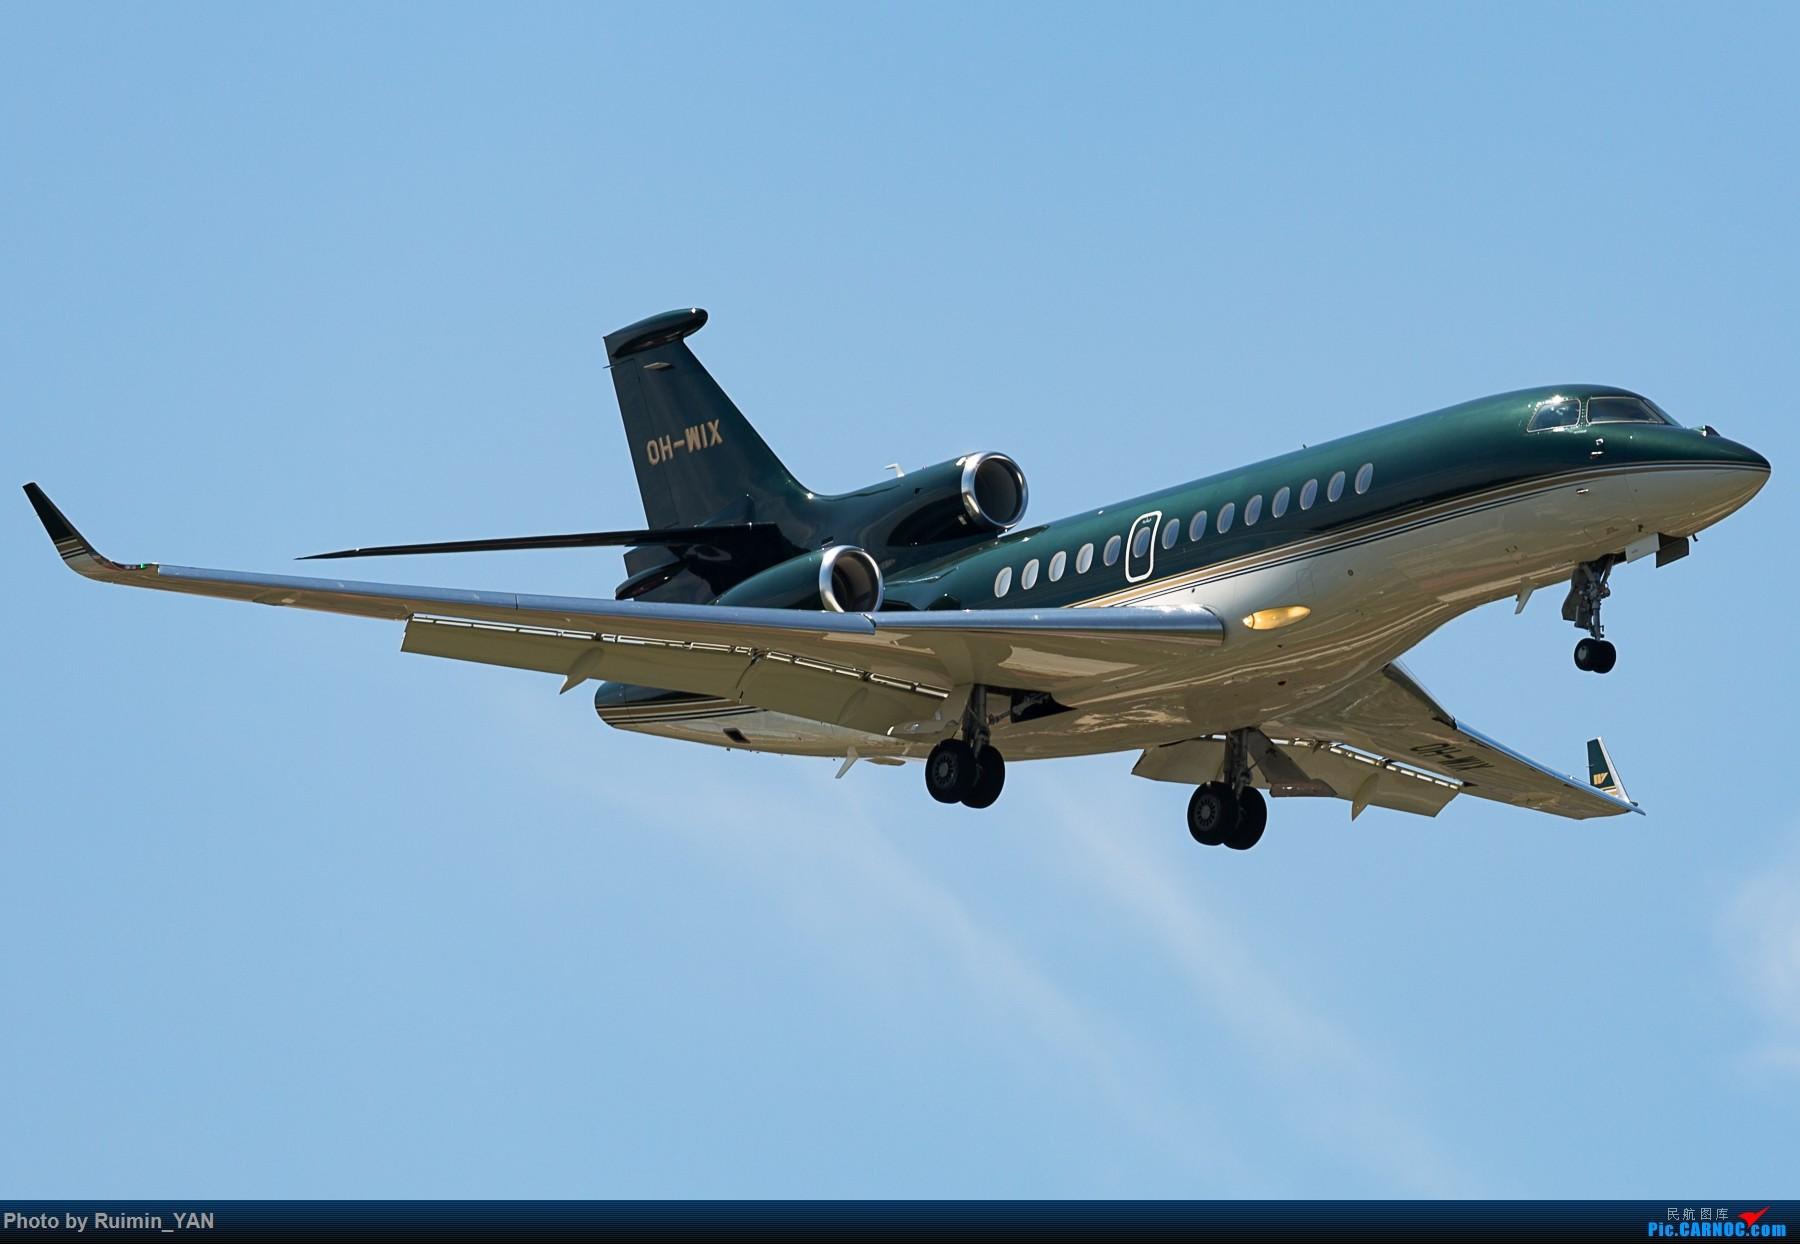 【PEK】【砖机】【公务机】未知领导访华 Jetflite OH-WIX Dassault Falcon 7X DASSAULT FALCON 7X OH-WIX 中国北京首都国际机场